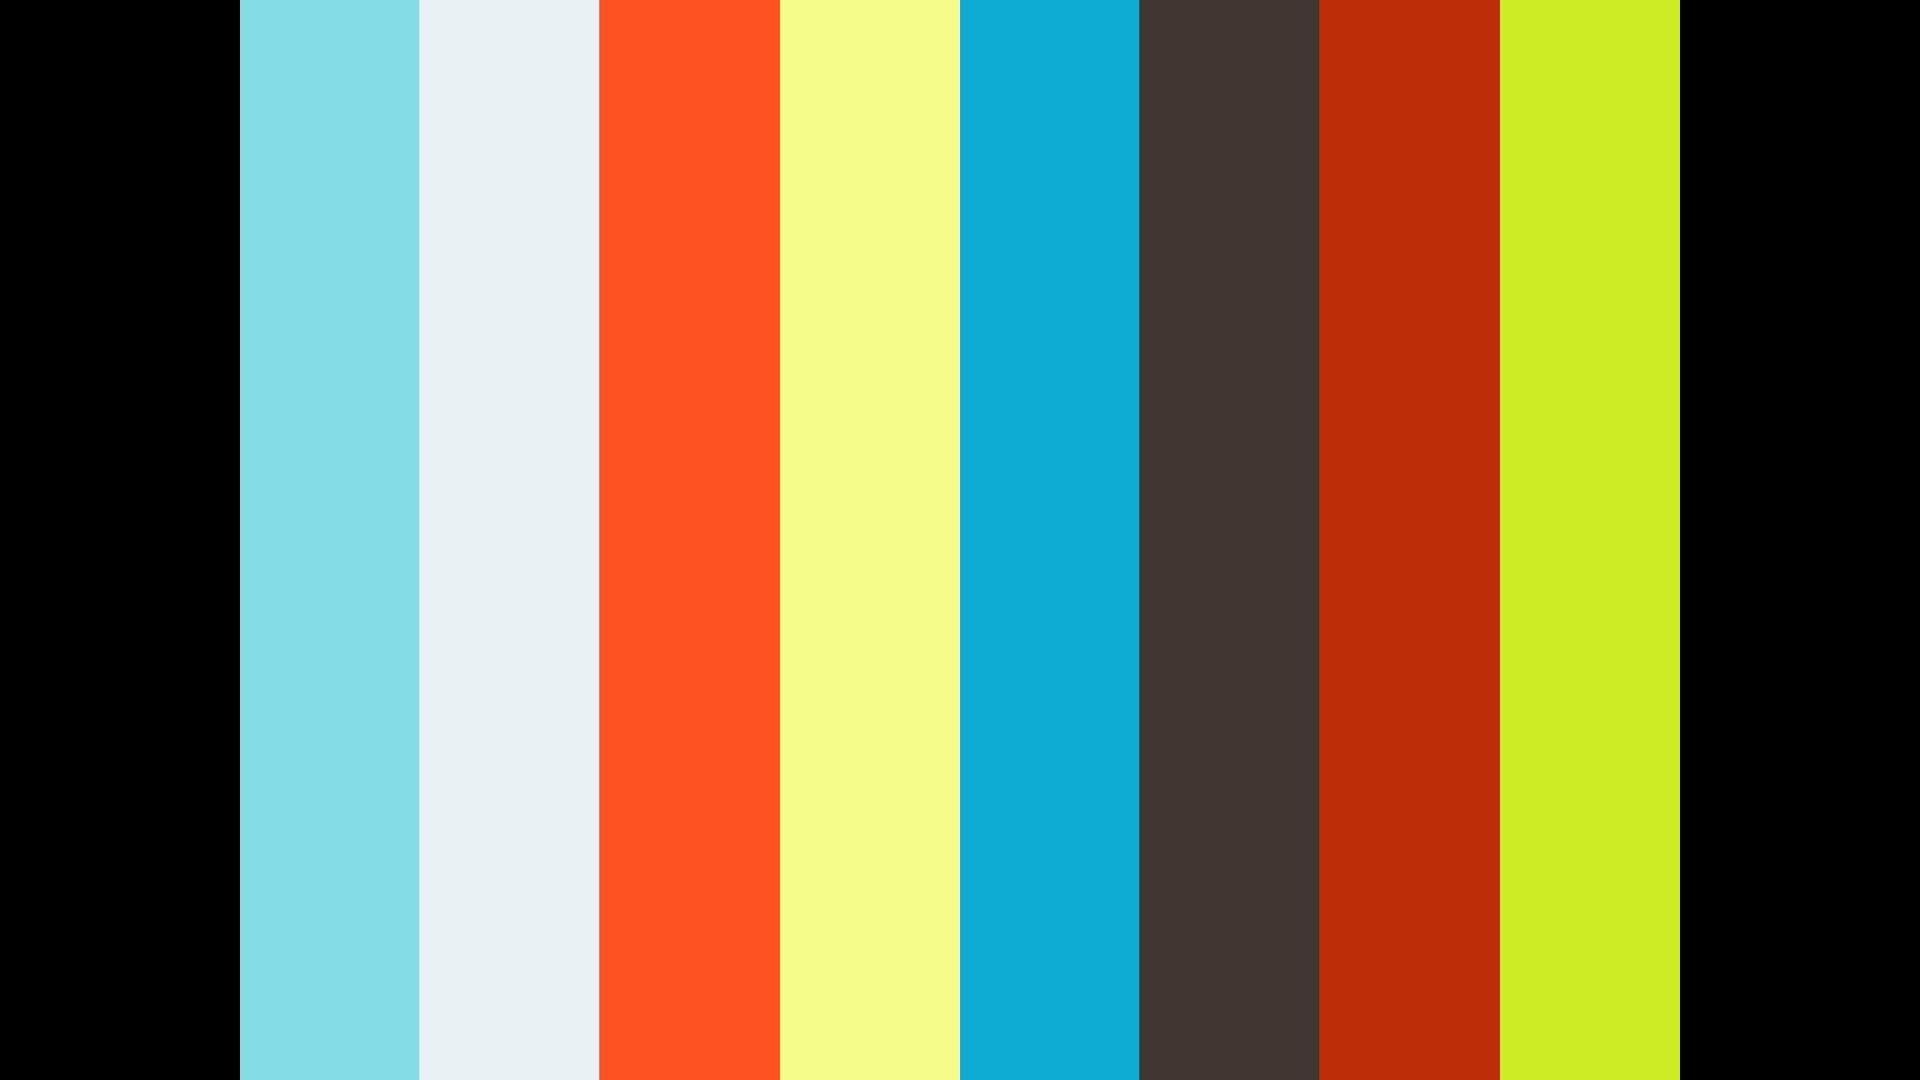 Styling - Alexis Facca - Biotonome